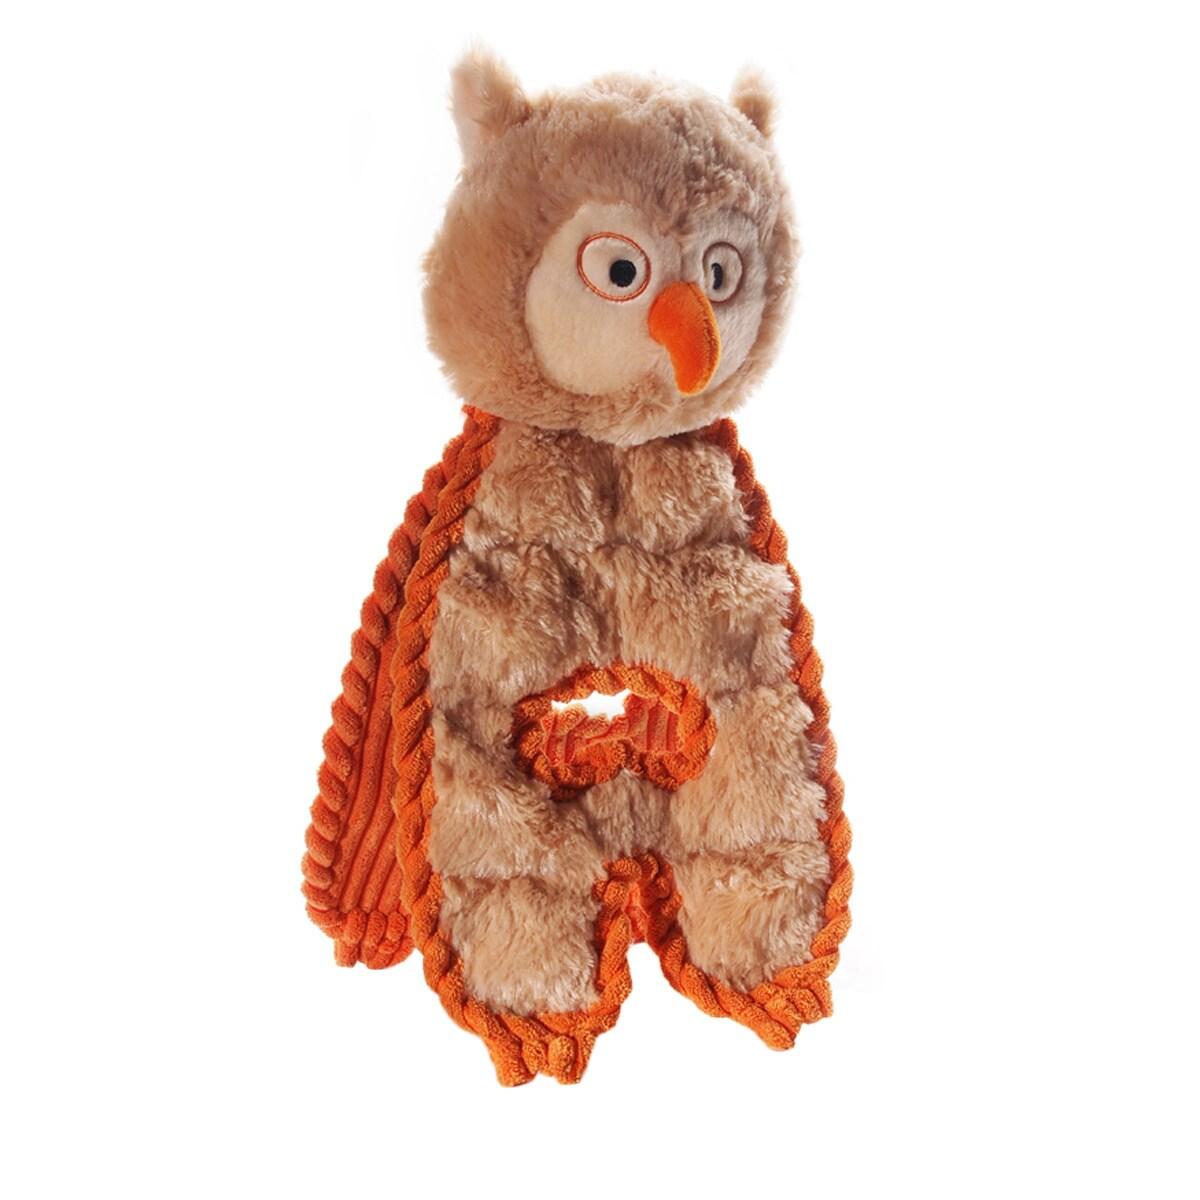 Charming Pet Products Cuddle Tug Owl (Owl)